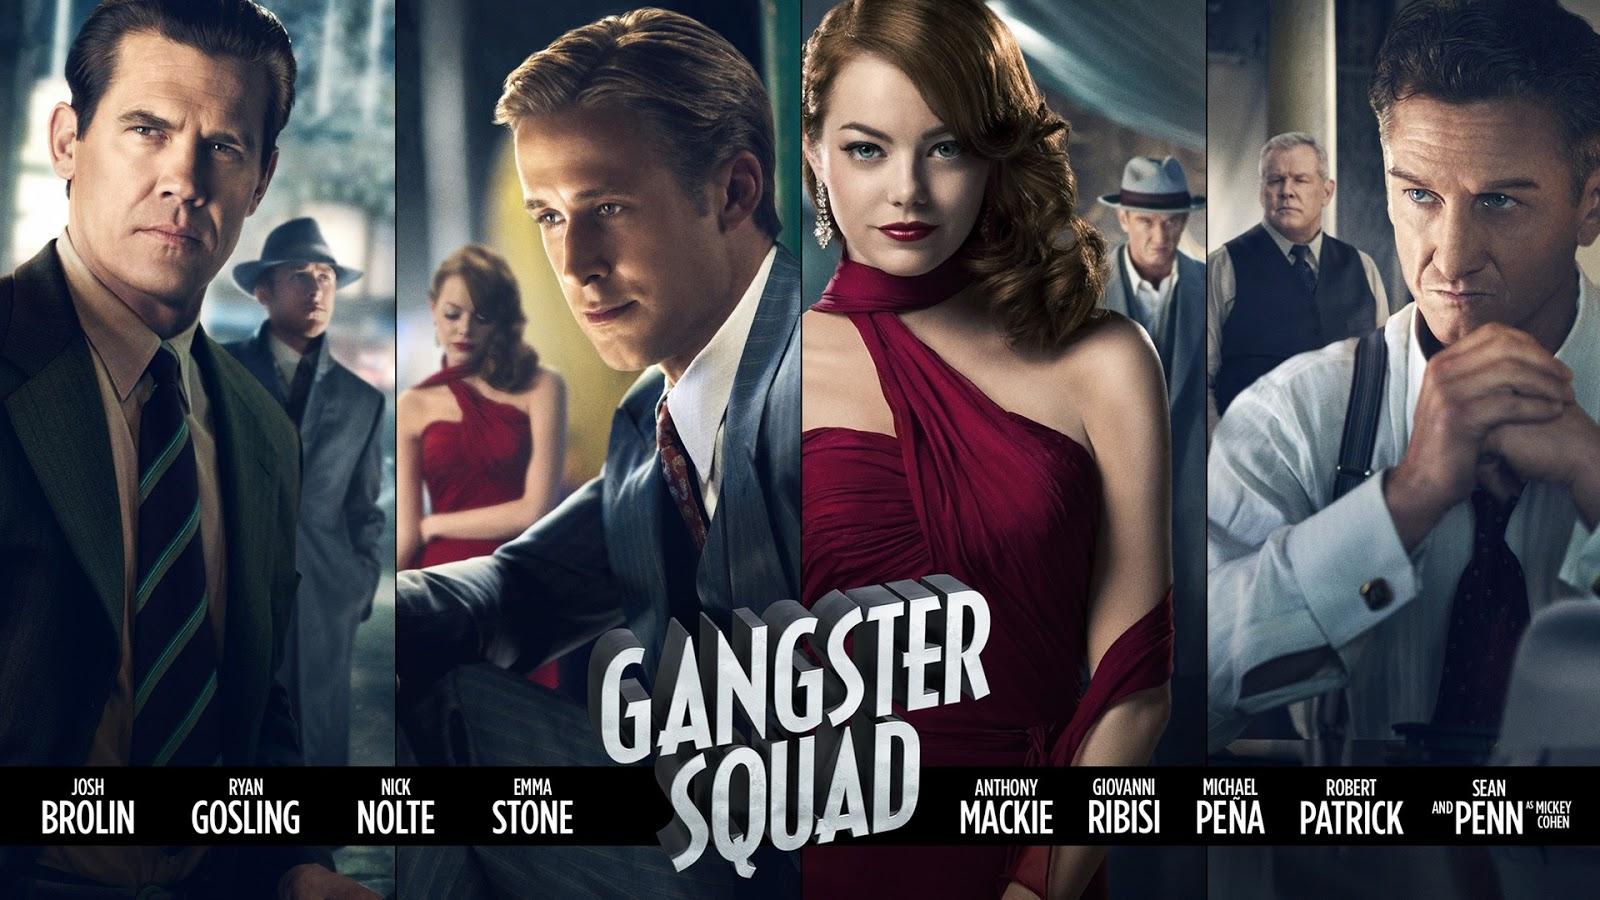 http://4.bp.blogspot.com/-U0Esp28knOI/UQTlBR3-jhI/AAAAAAAAD50/Mt7k1GmMYfU/s1600/Gangster_Squad_2013.jpg